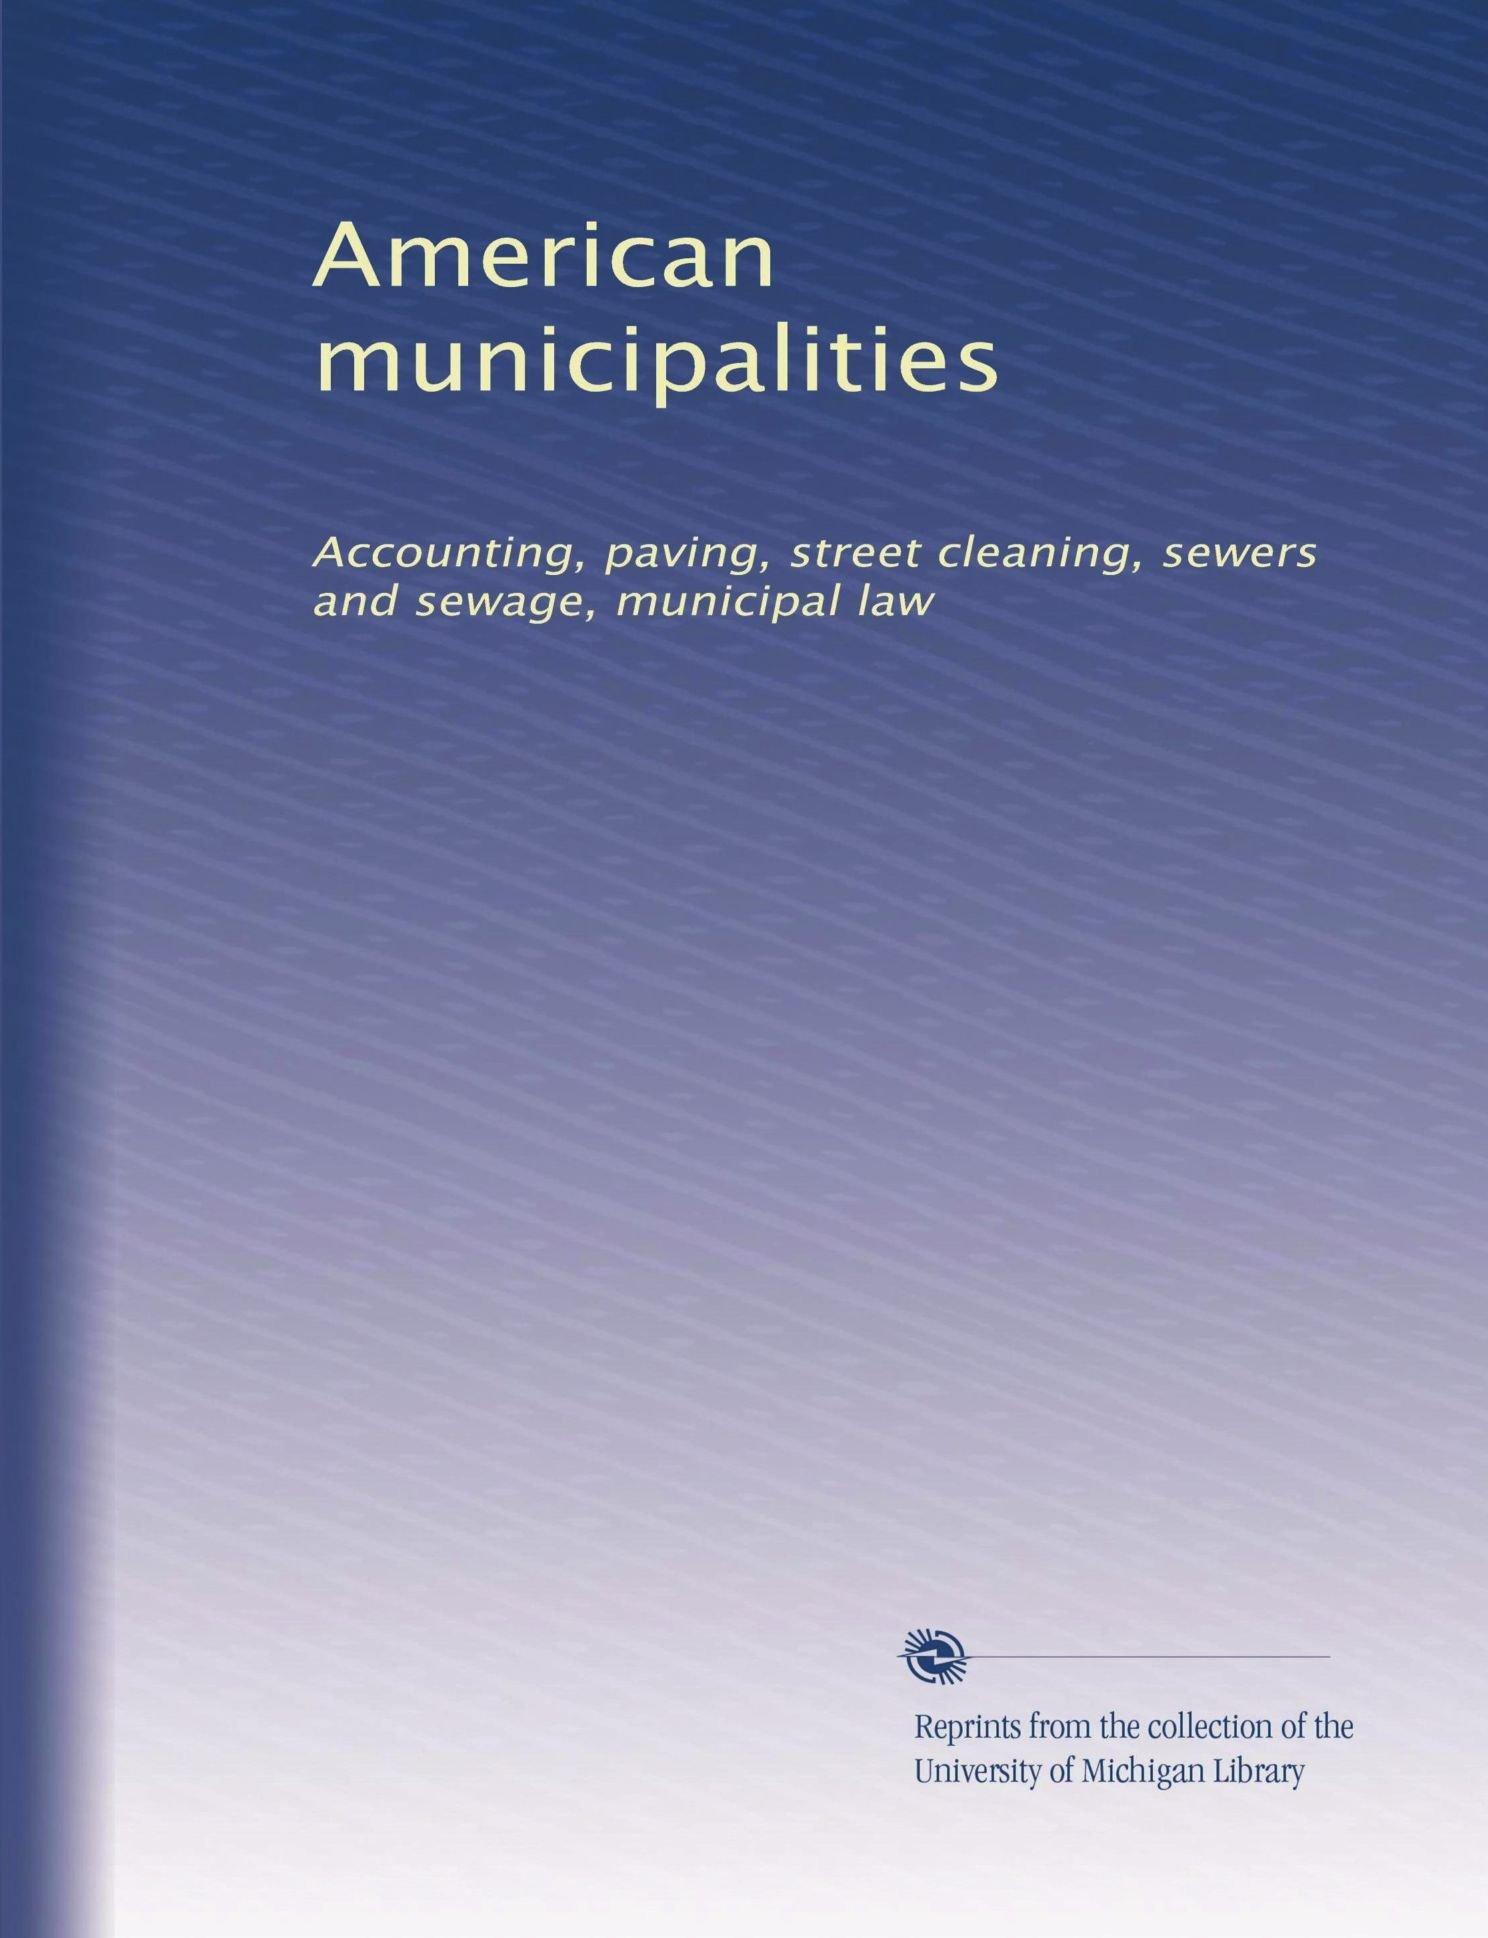 Download American municipalities: Accounting, paving, street cleaning, sewers and sewage, municipal law ebook